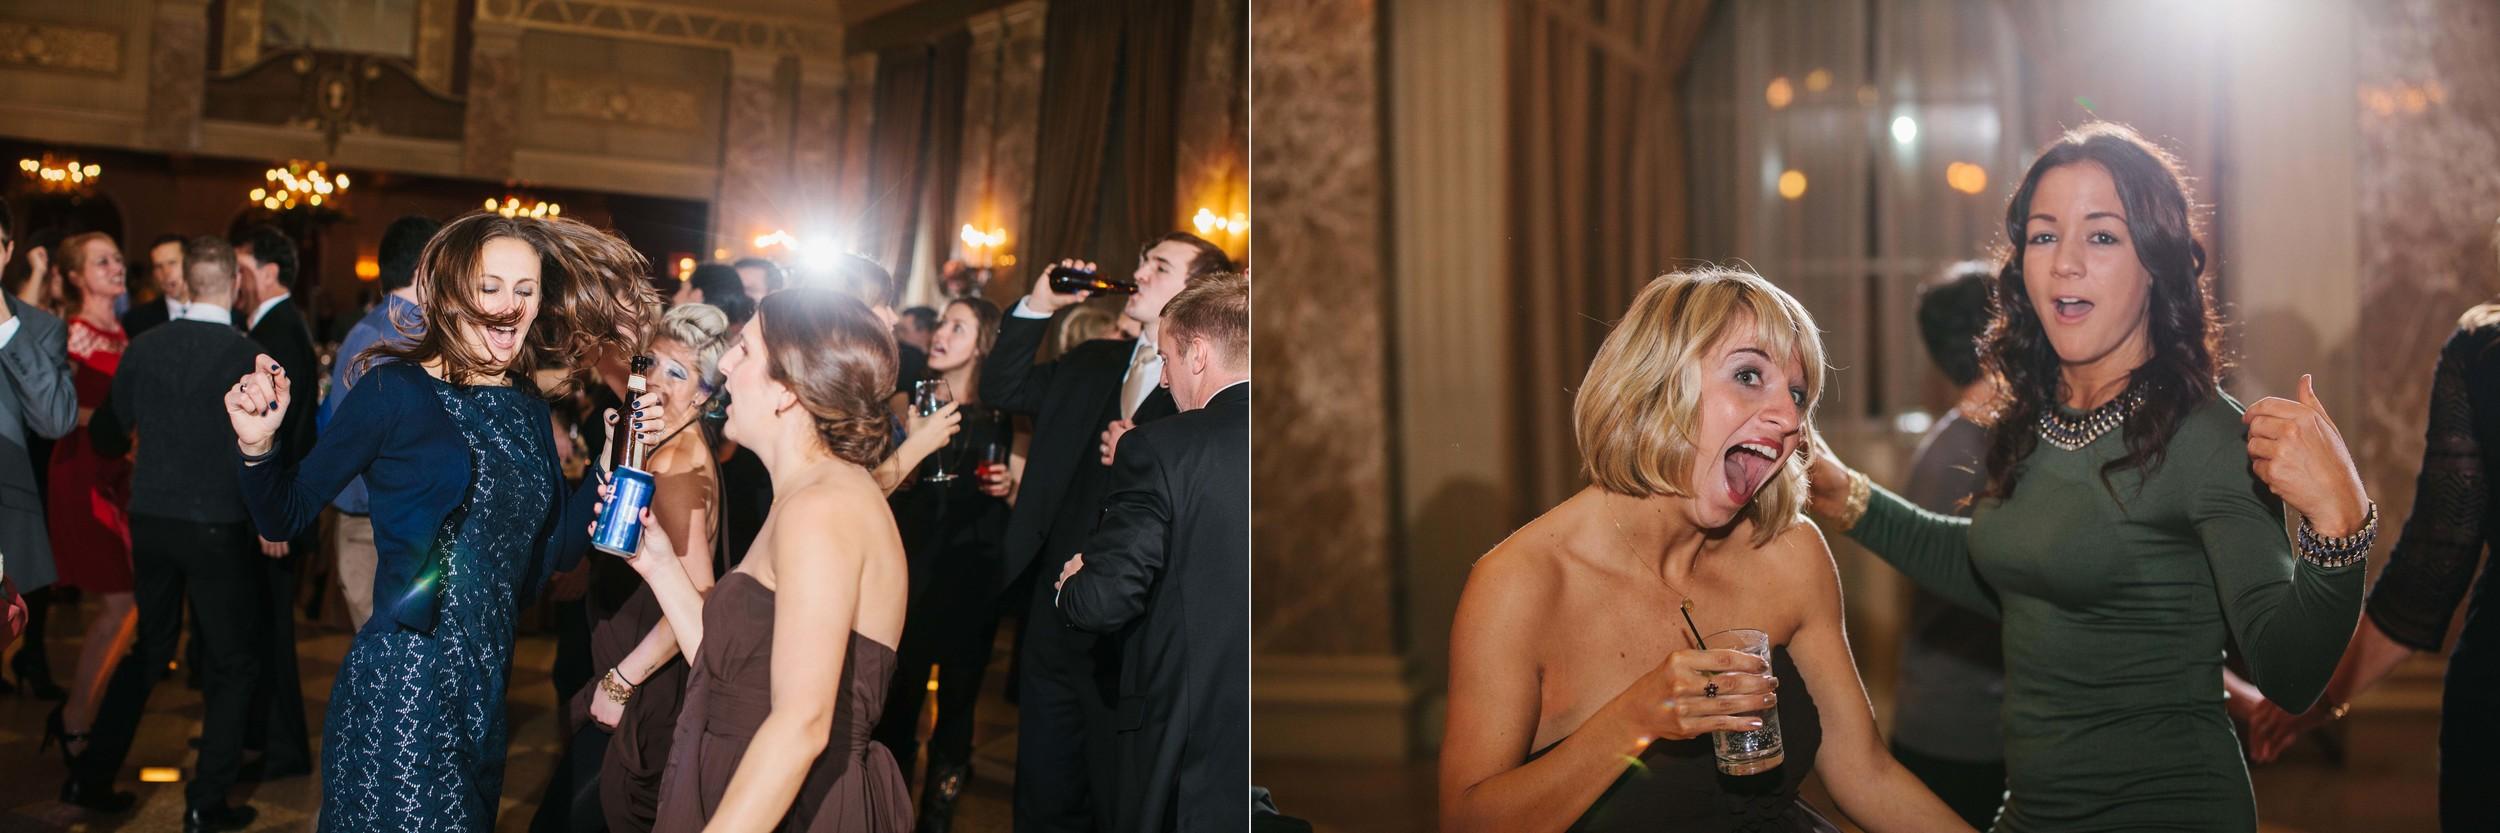 St Louis Wedding Photography-1097 copy.jpg